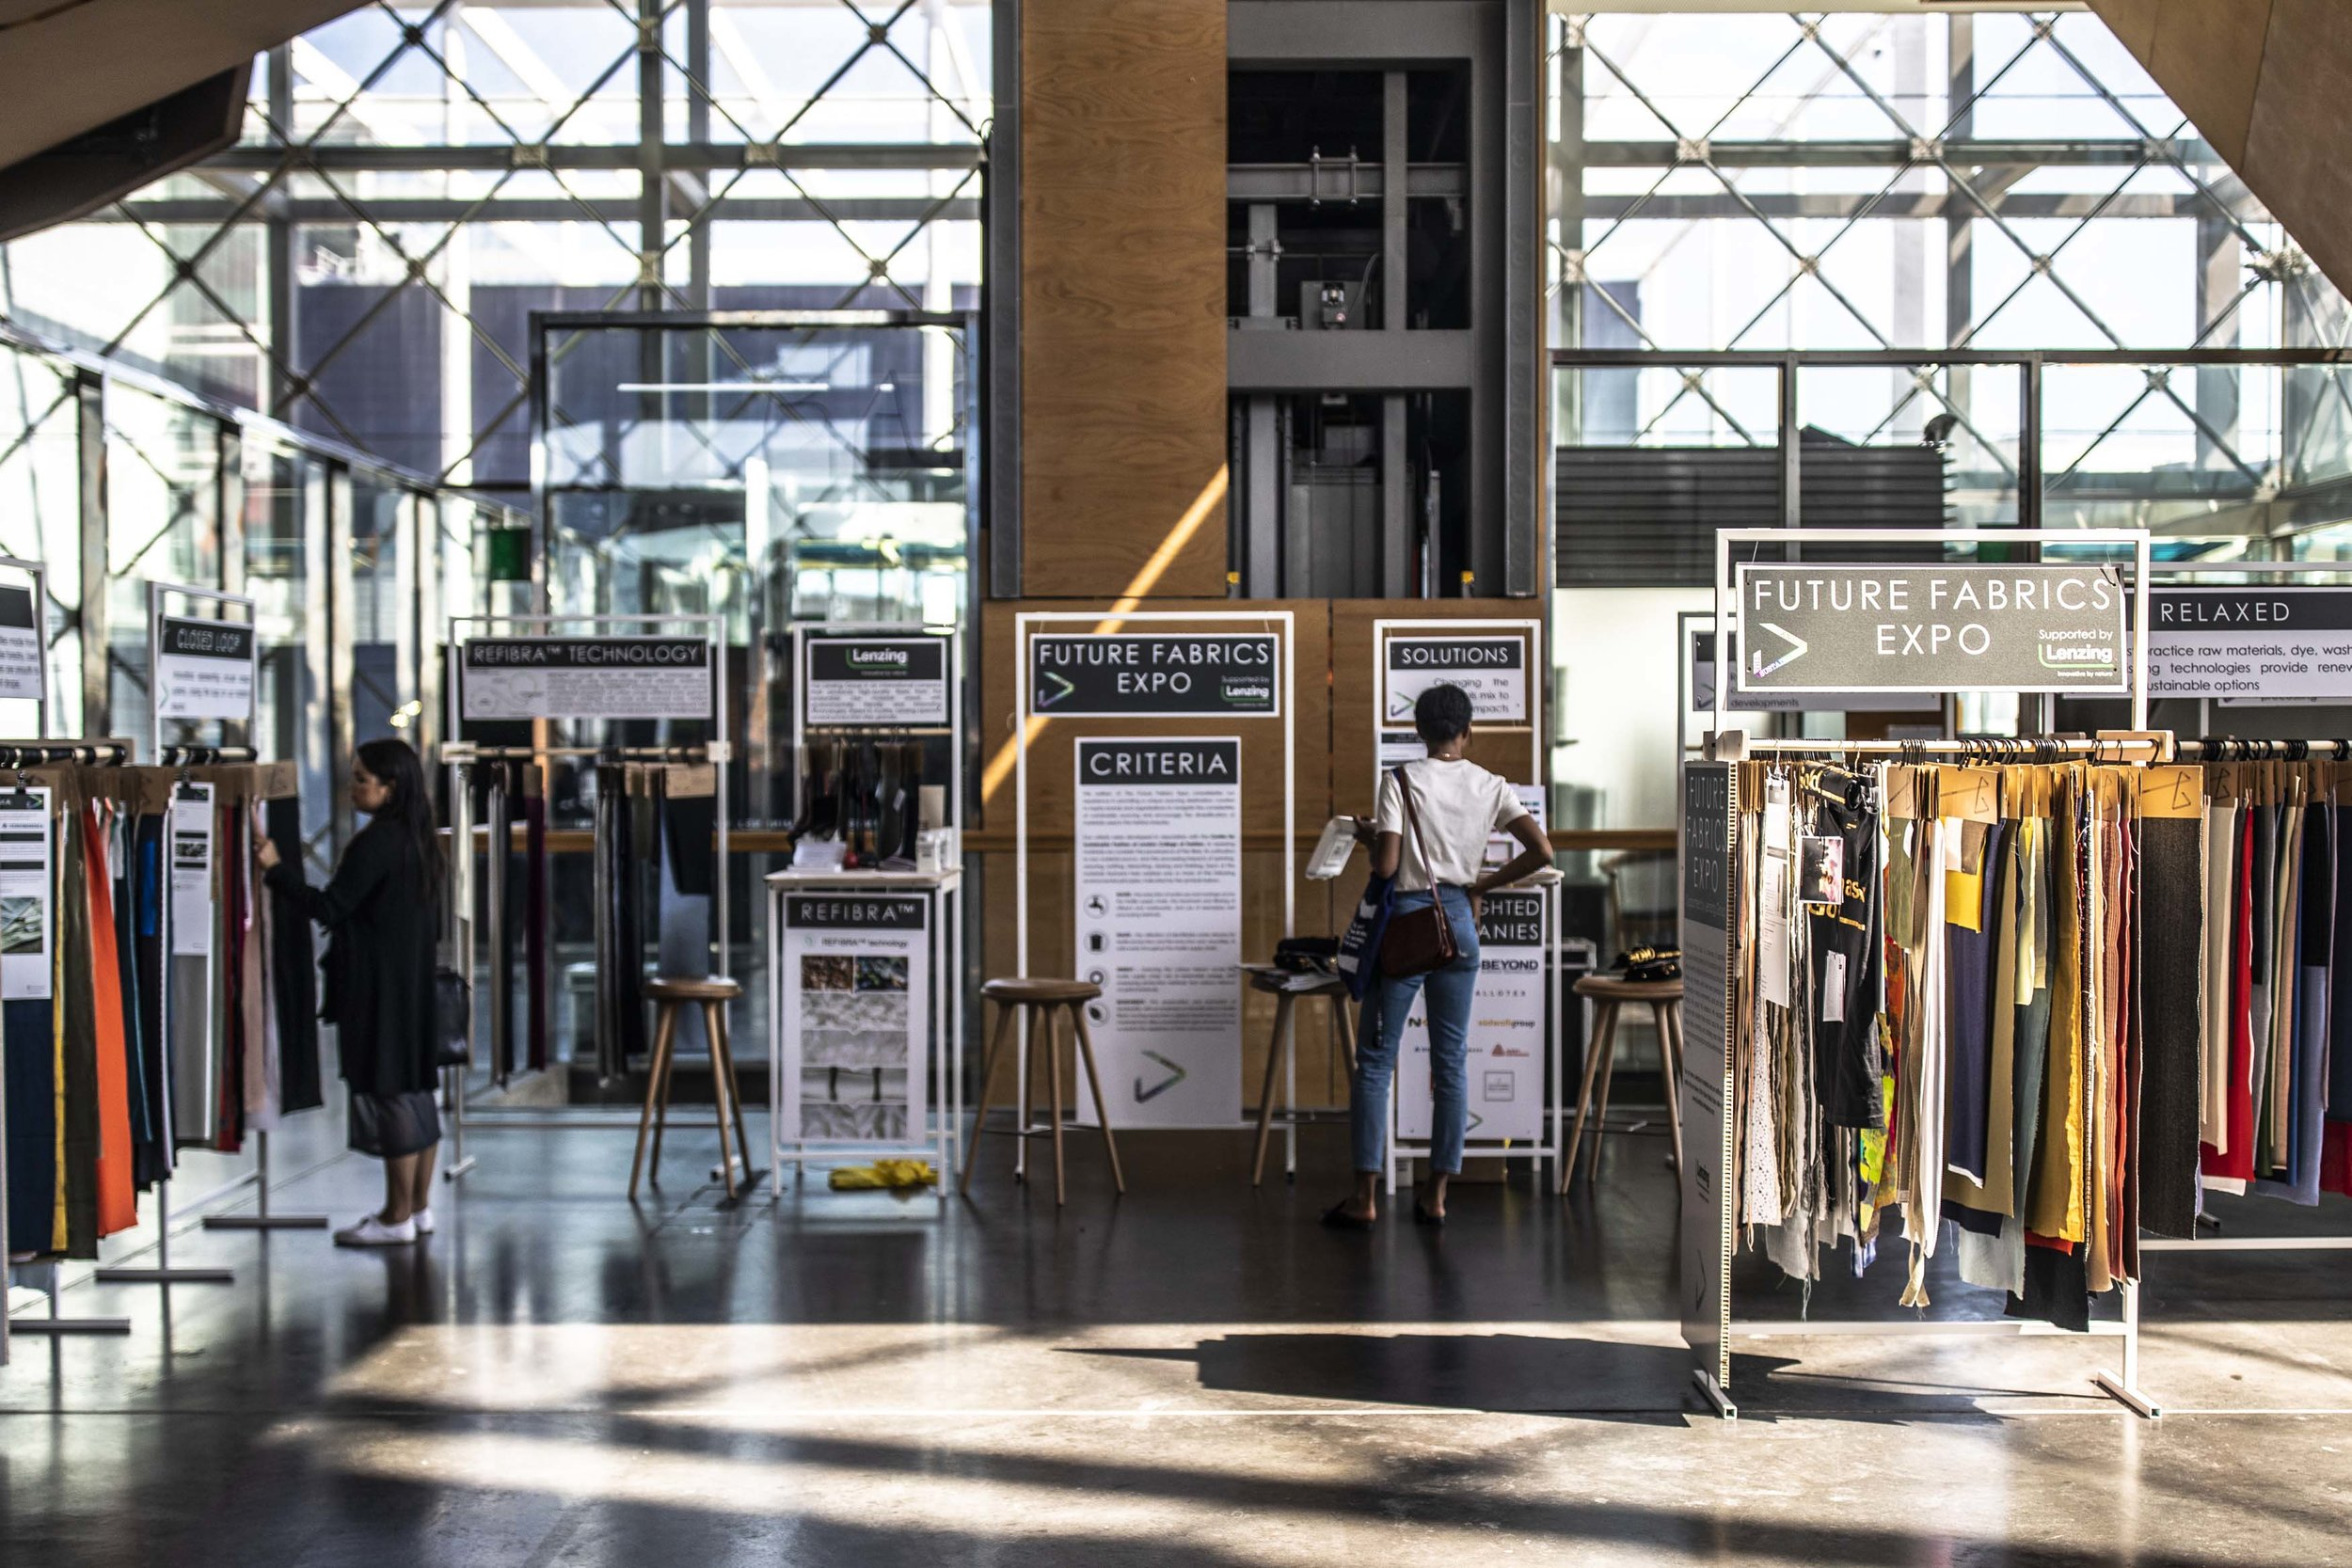 Future Fabrics Expo by The Sustainable Angle